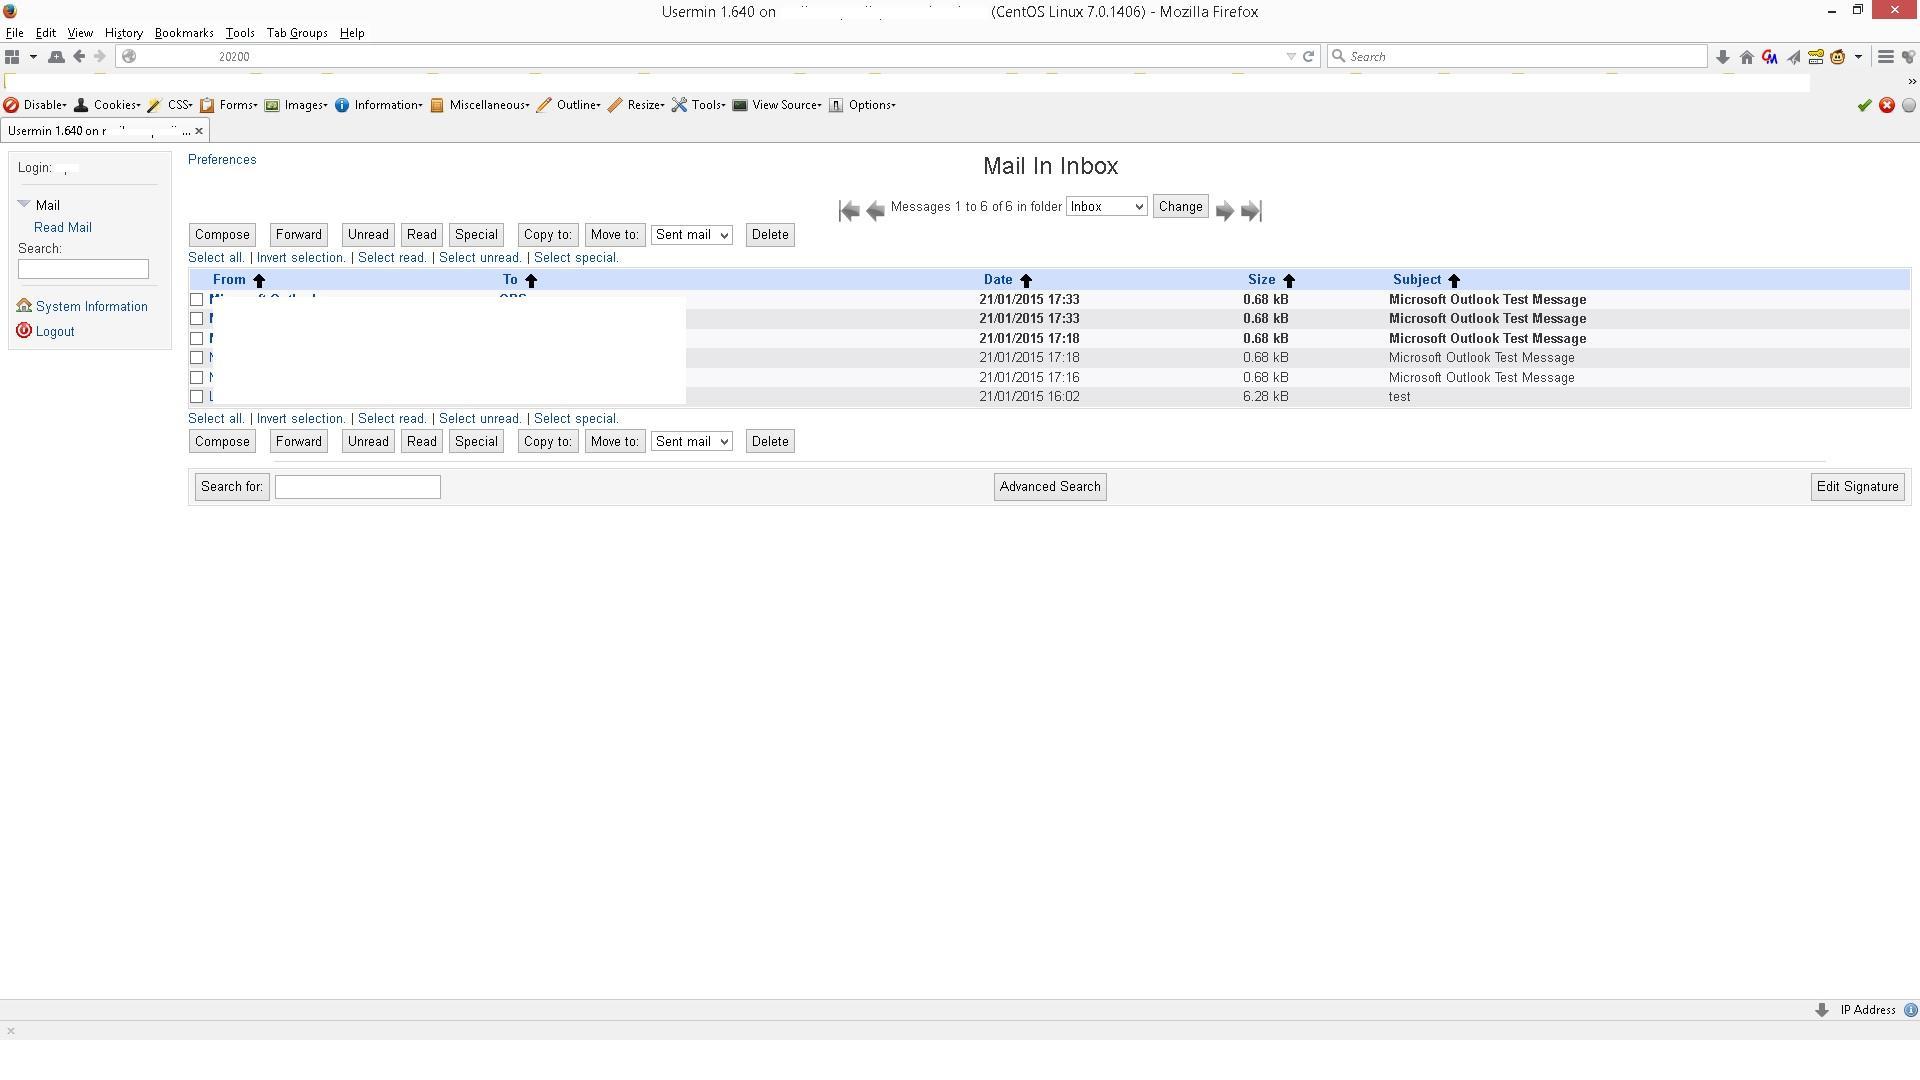 Webmin / Bugs / #4557 Usermin Gray Framed Themed Error Read Mail ...